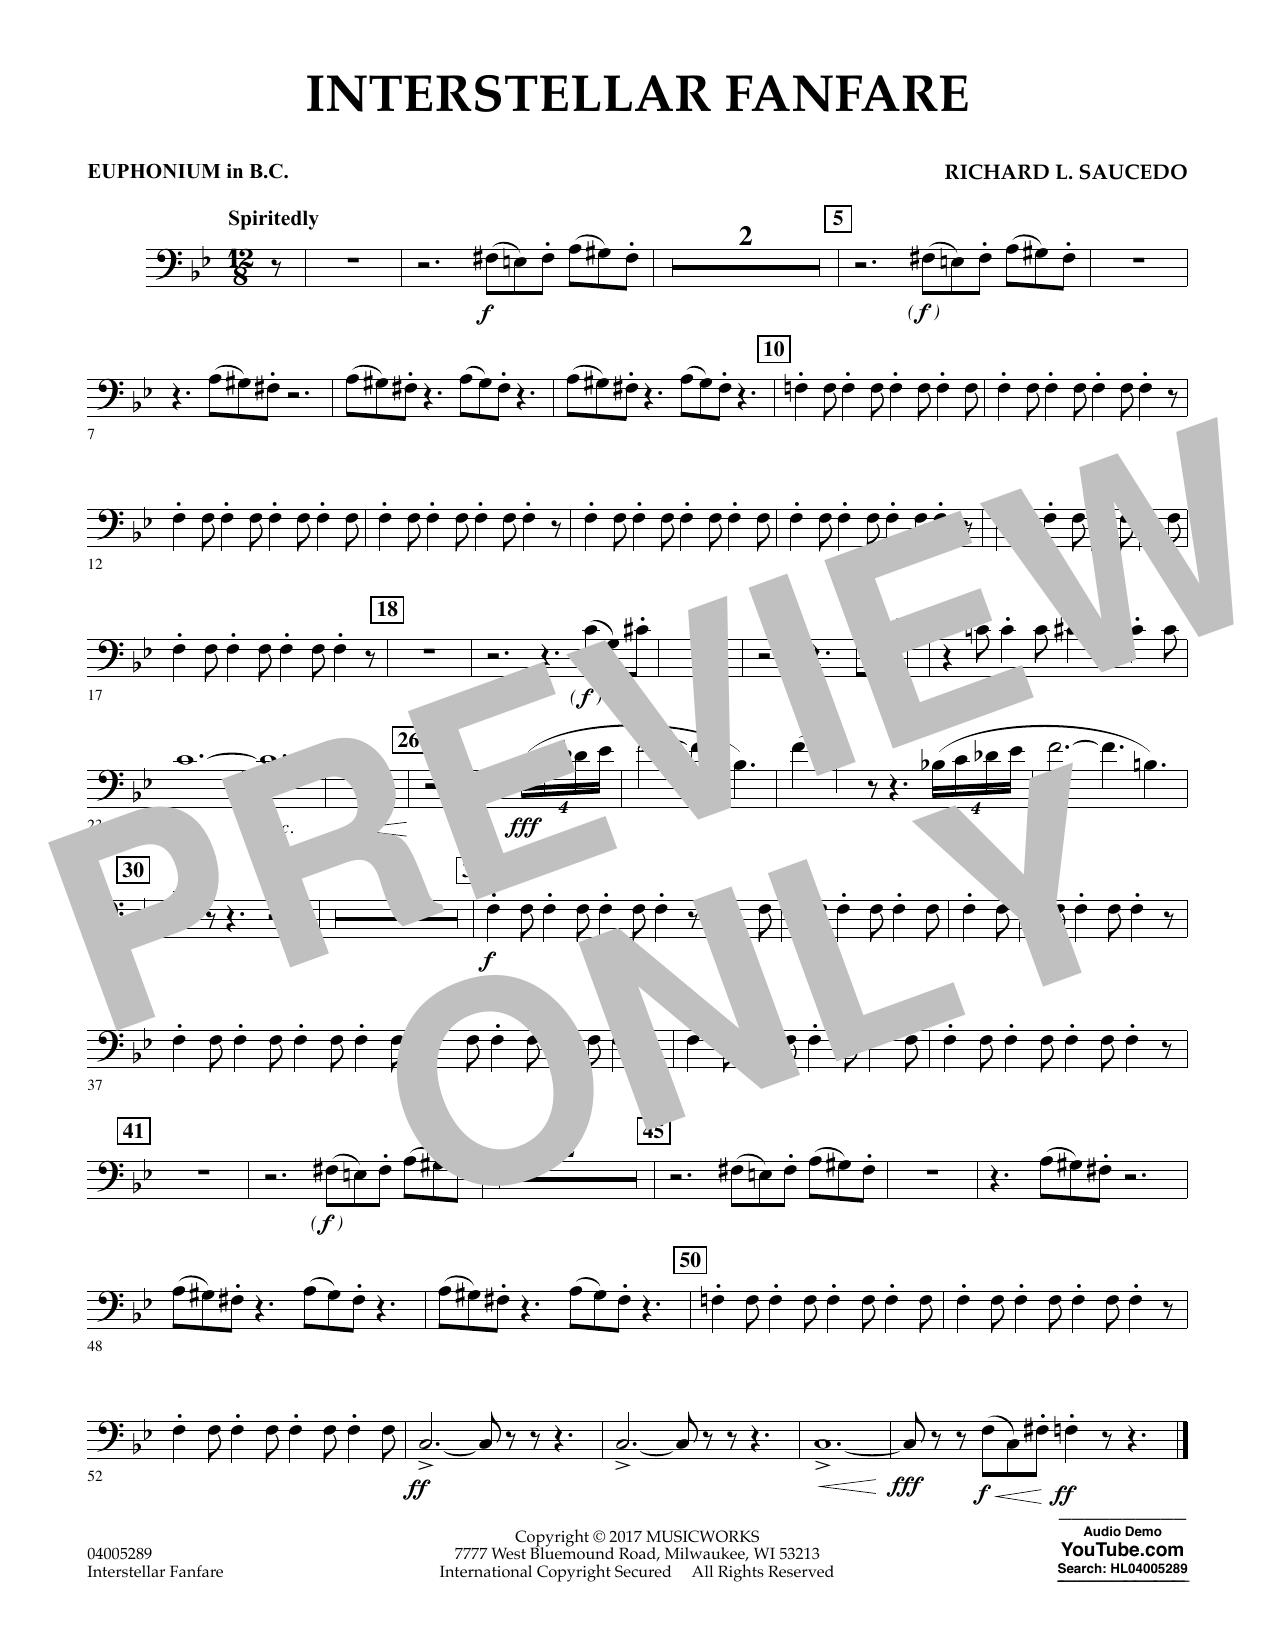 Richard L. Saucedo Interstellar Fanfare - Euphonium in Bass Clef sheet music notes printable PDF score